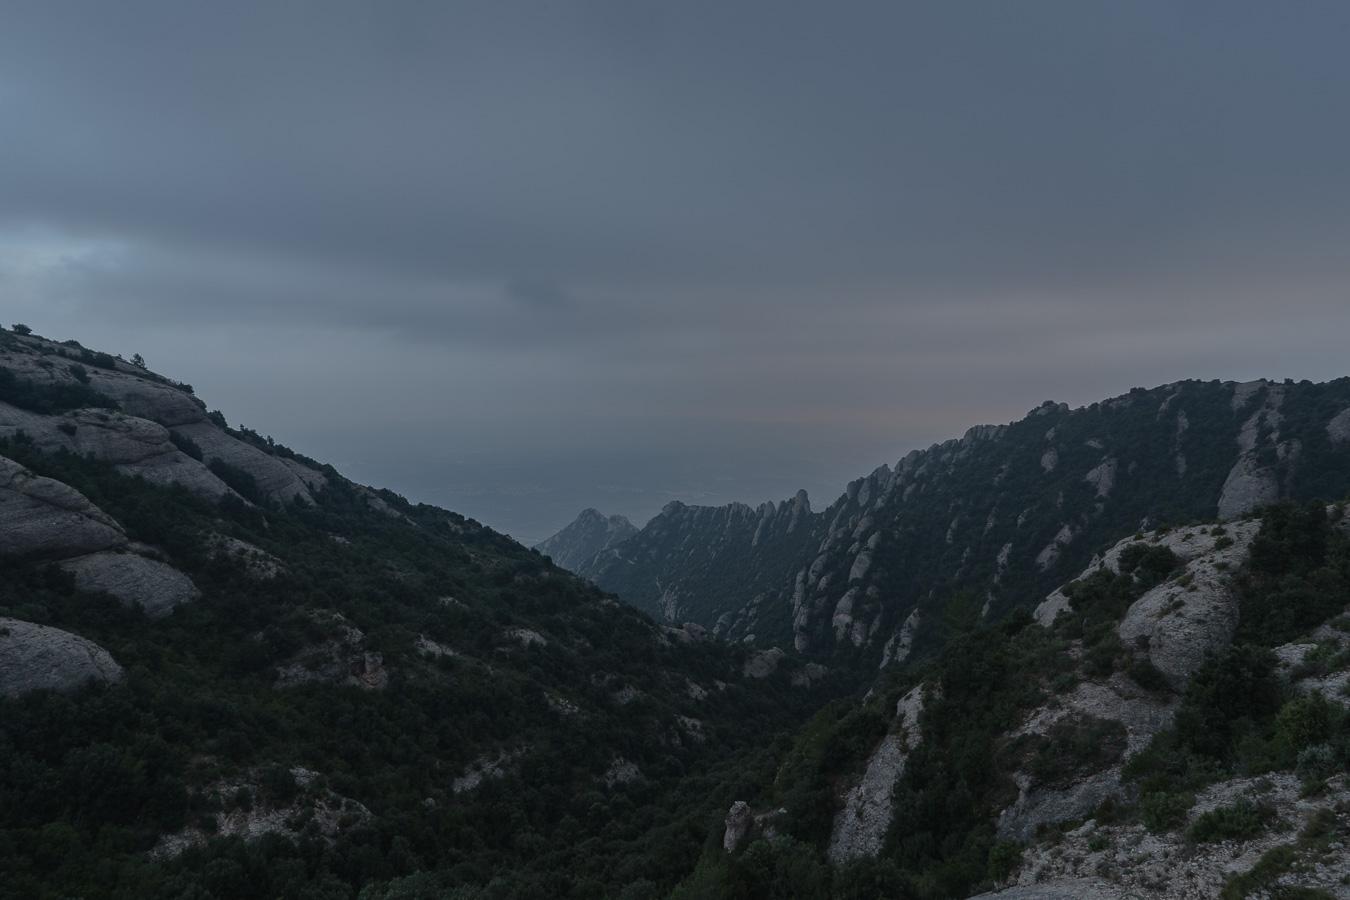 Montserrat at the dusk